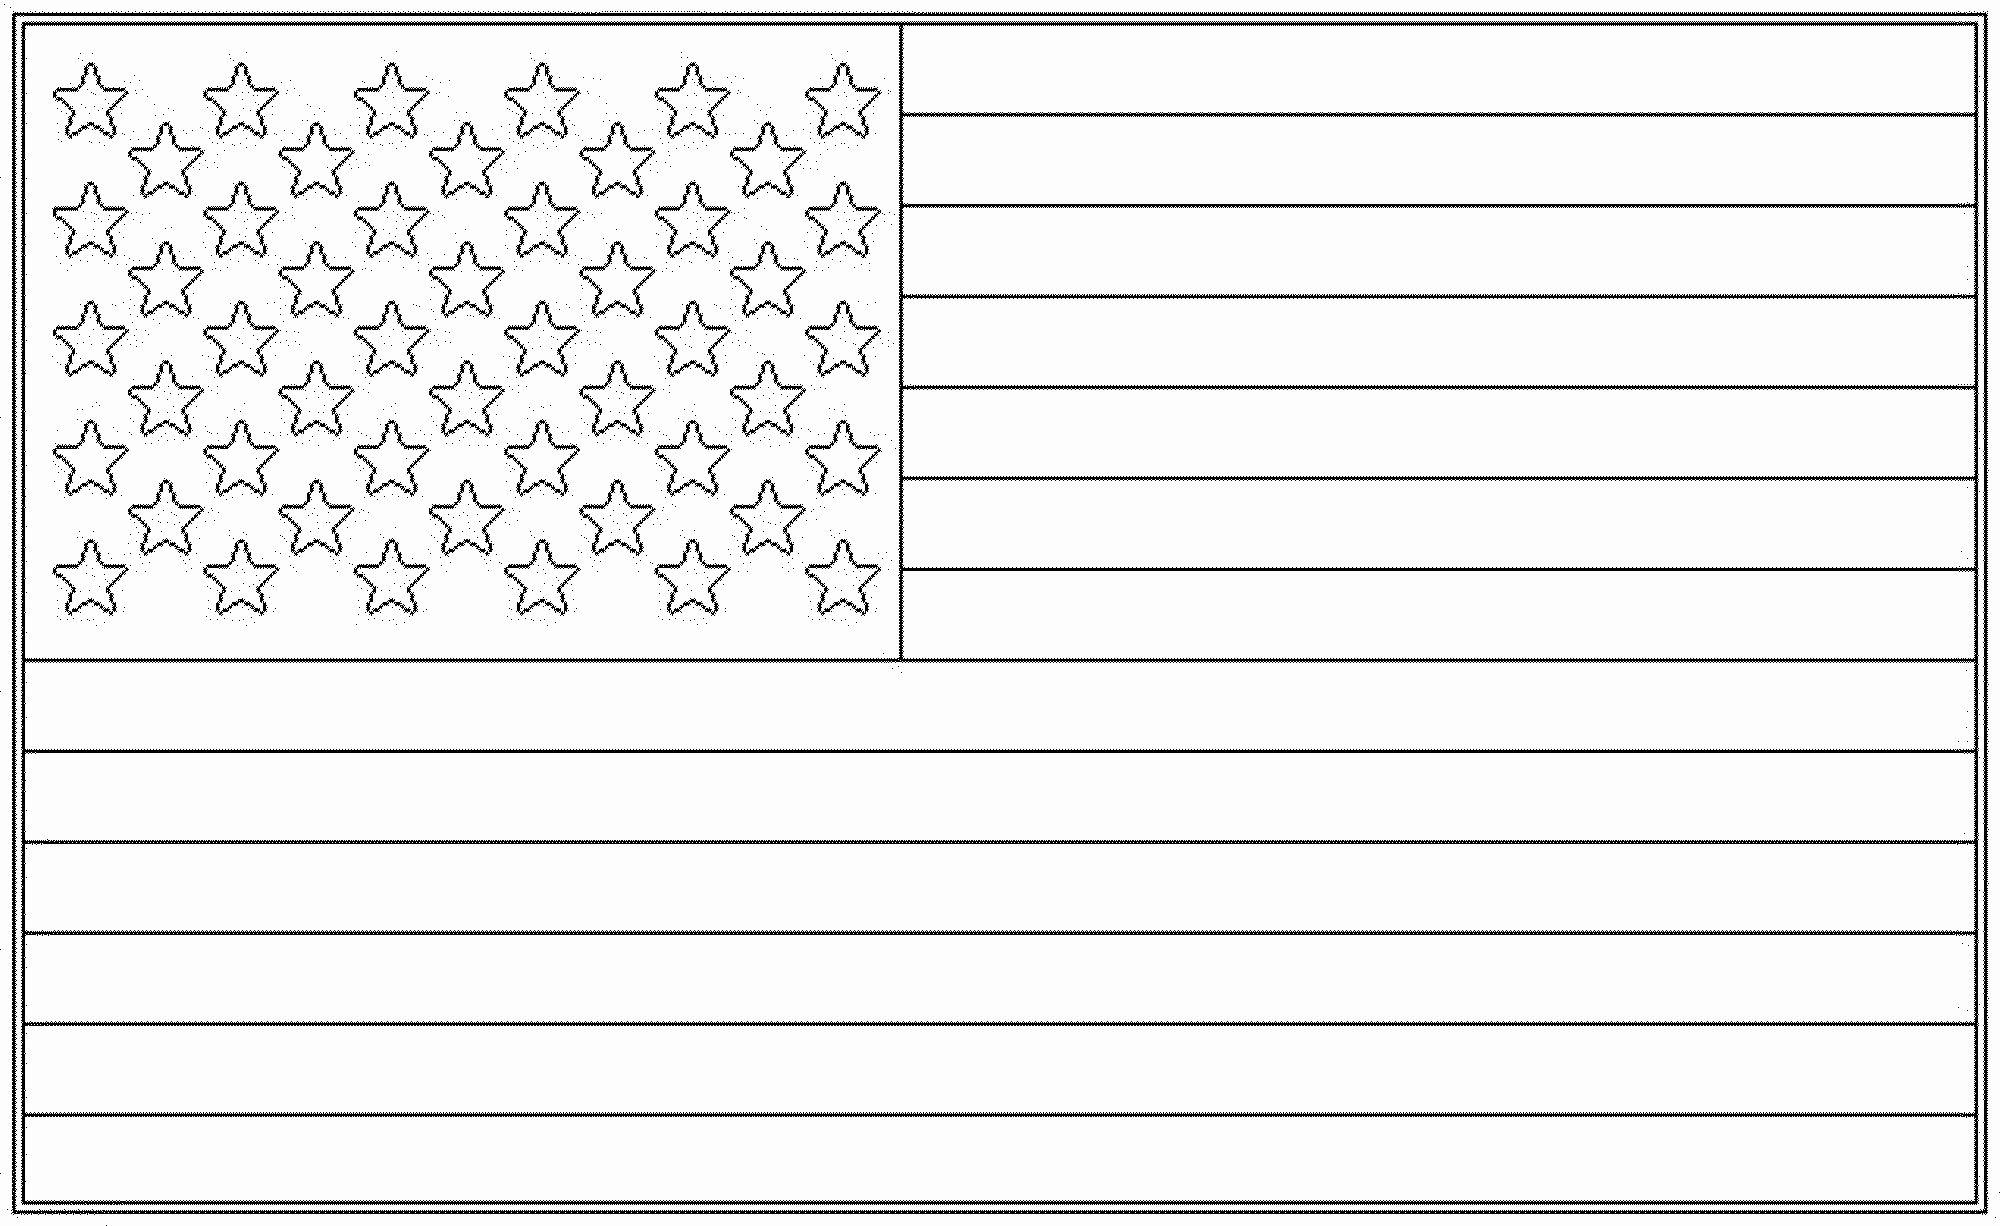 Flag Day Coloring Sheets Inspirational Coloring Sheets 53